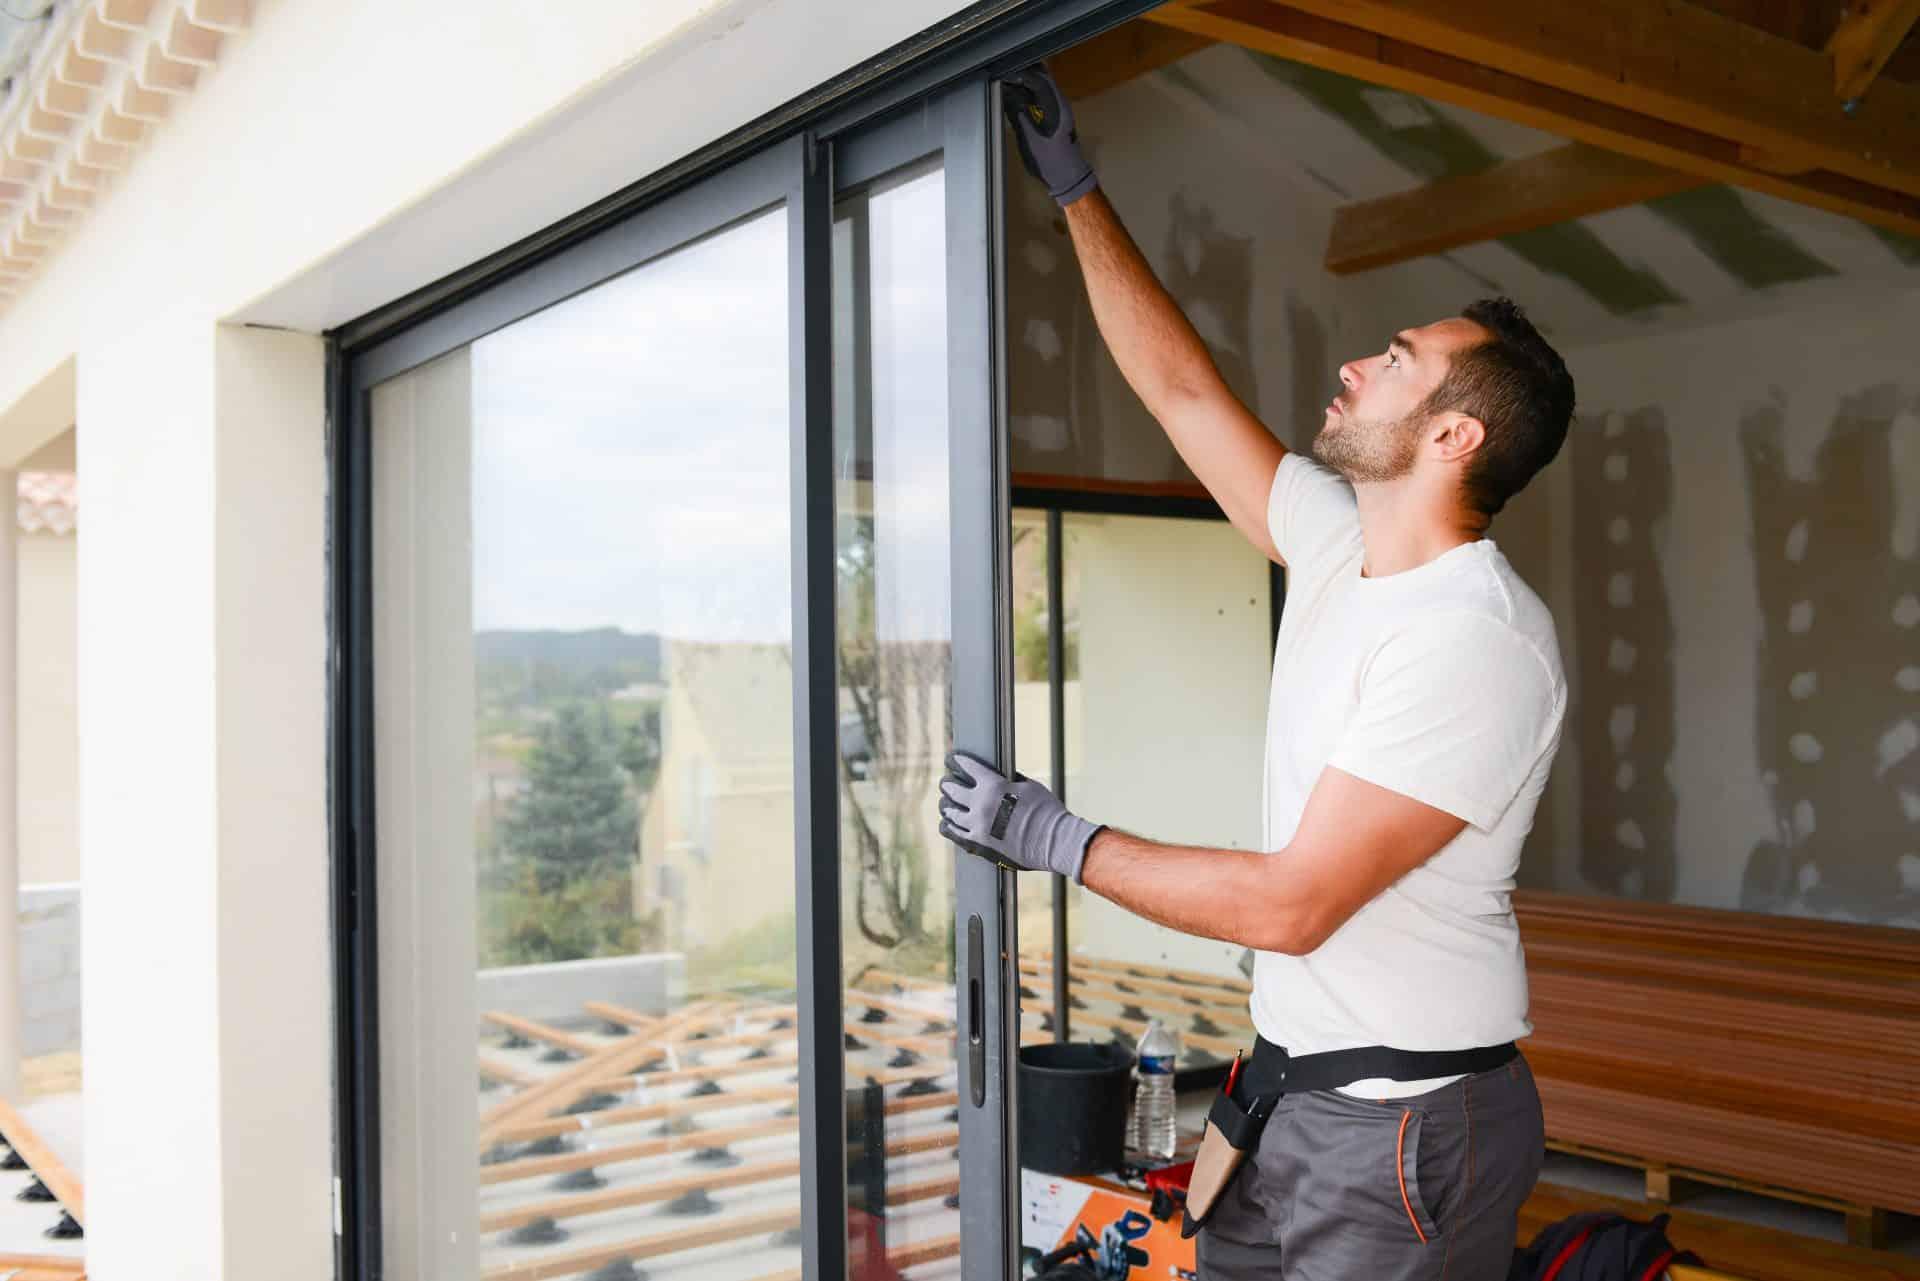 Installer une porte-fenêtre